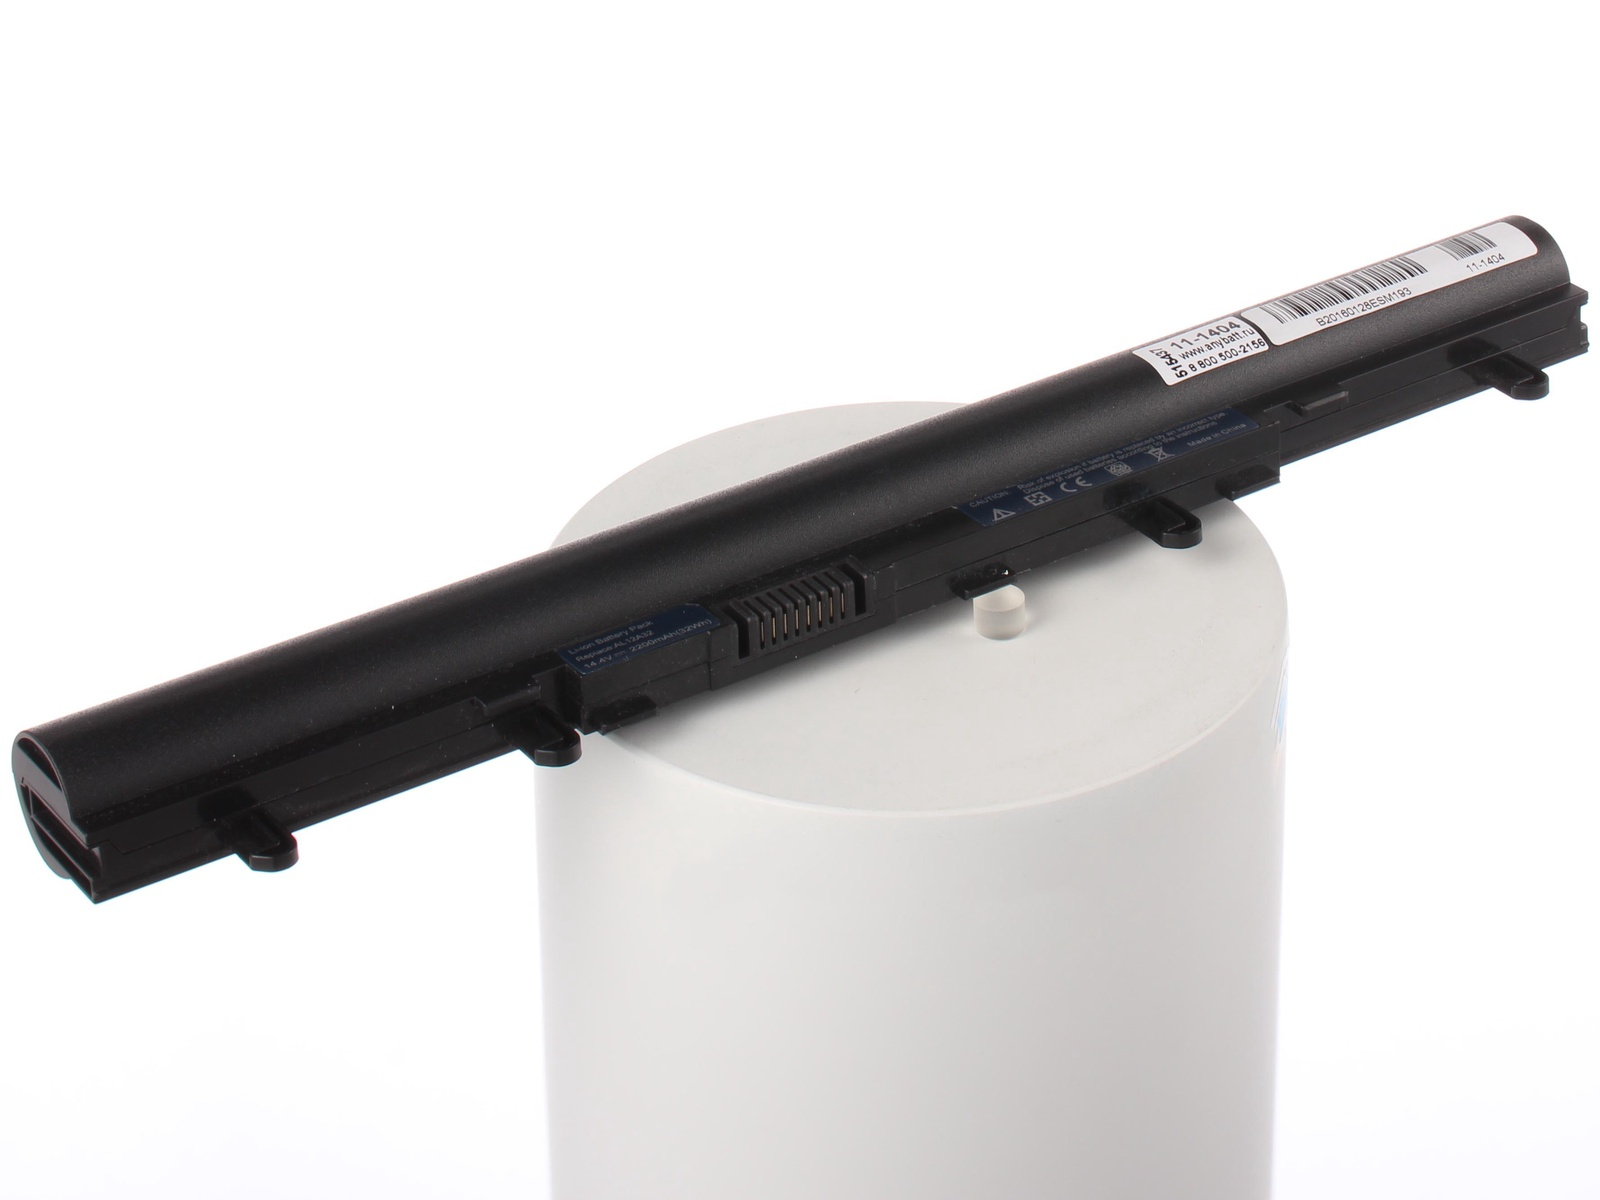 Аккумулятор для ноутбука AnyBatt для Acer Aspire E1-522-45008G1TMnkk, Aspire E1-570G-33214G50Mnkk, Aspire E1-572G-54204G1TMn, ASPIRE F5-571-594N, Aspire V5-571G-53336G50Makk, Aspire V5-571G-33224G50Makk аккумулятор для ноутбука anybatt для acer aspire e1 532g 35584g50mnkk aspire e1 570g 33214g32mnkk aspire v5 571pg 73536g75ma aspire e1 470p 6659 aspire e1 522 12504g50mn aspire e1 522 45004g1tmn aspire e1 570g 33214g50mnii